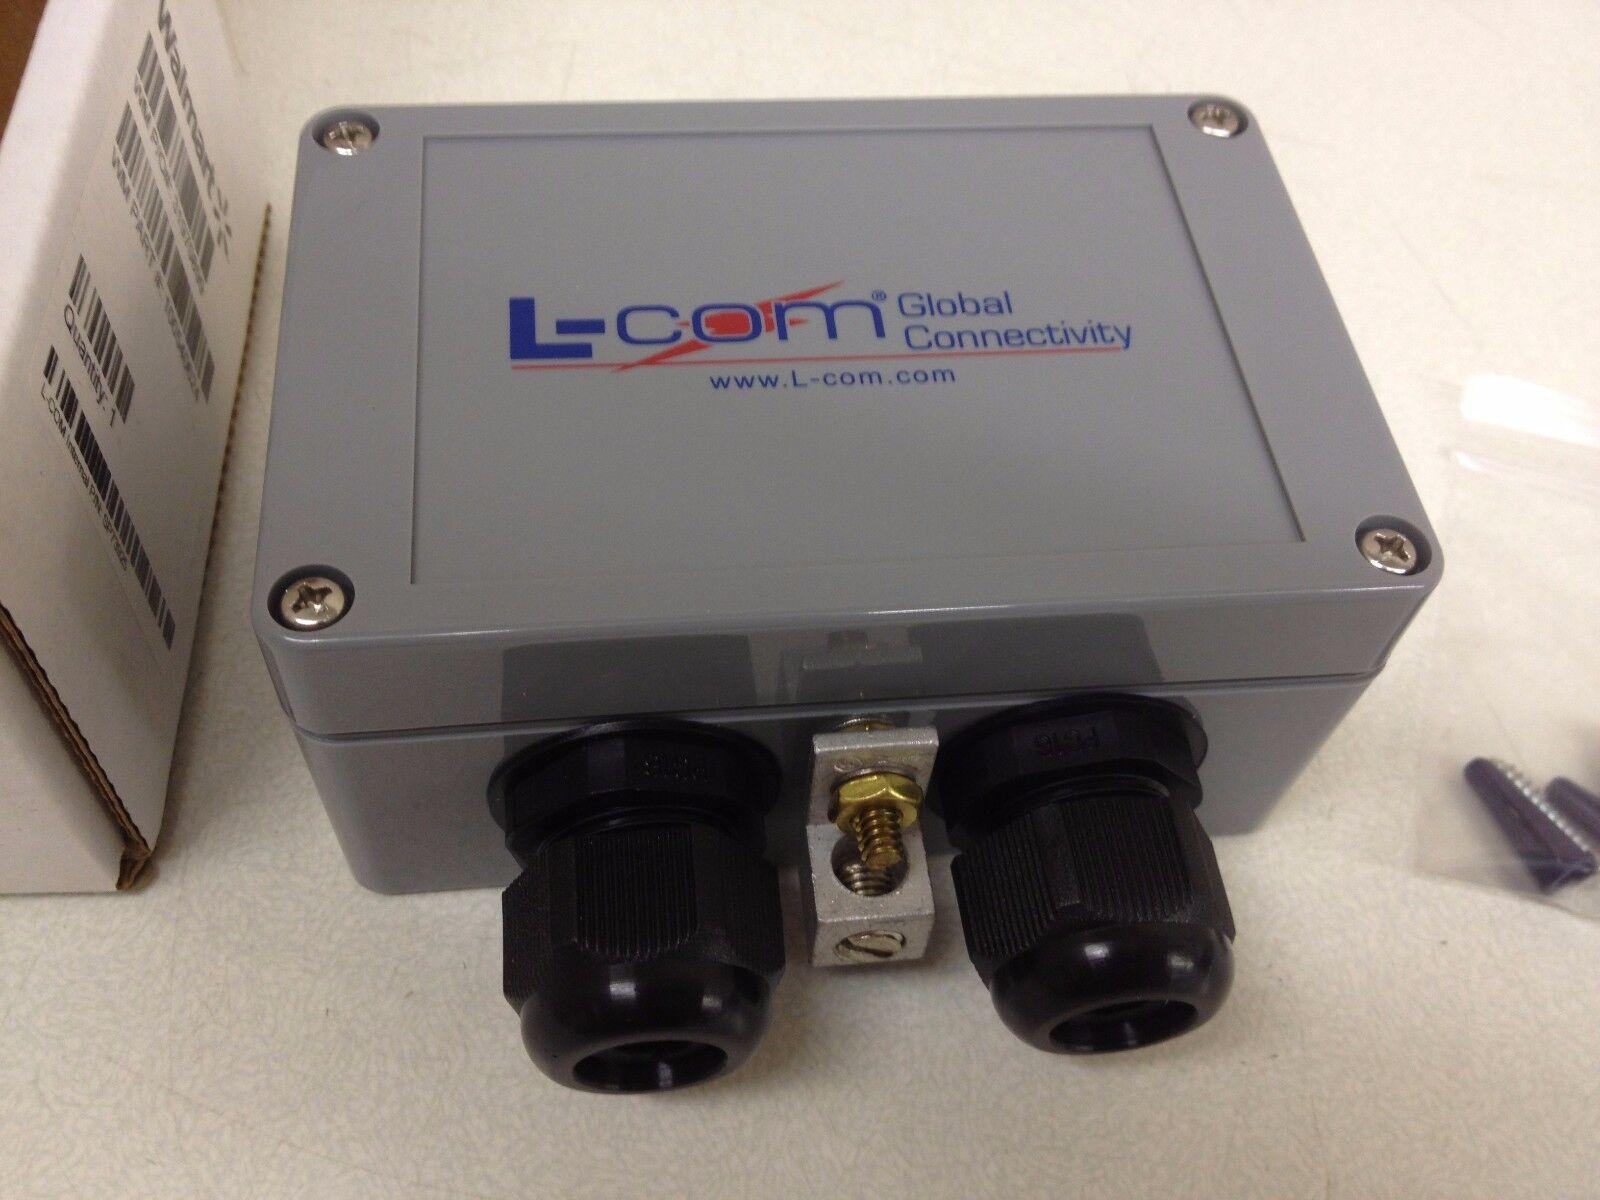 NEW L-Com CAT5e Weatherproof Lightning Surge Protector SP73925